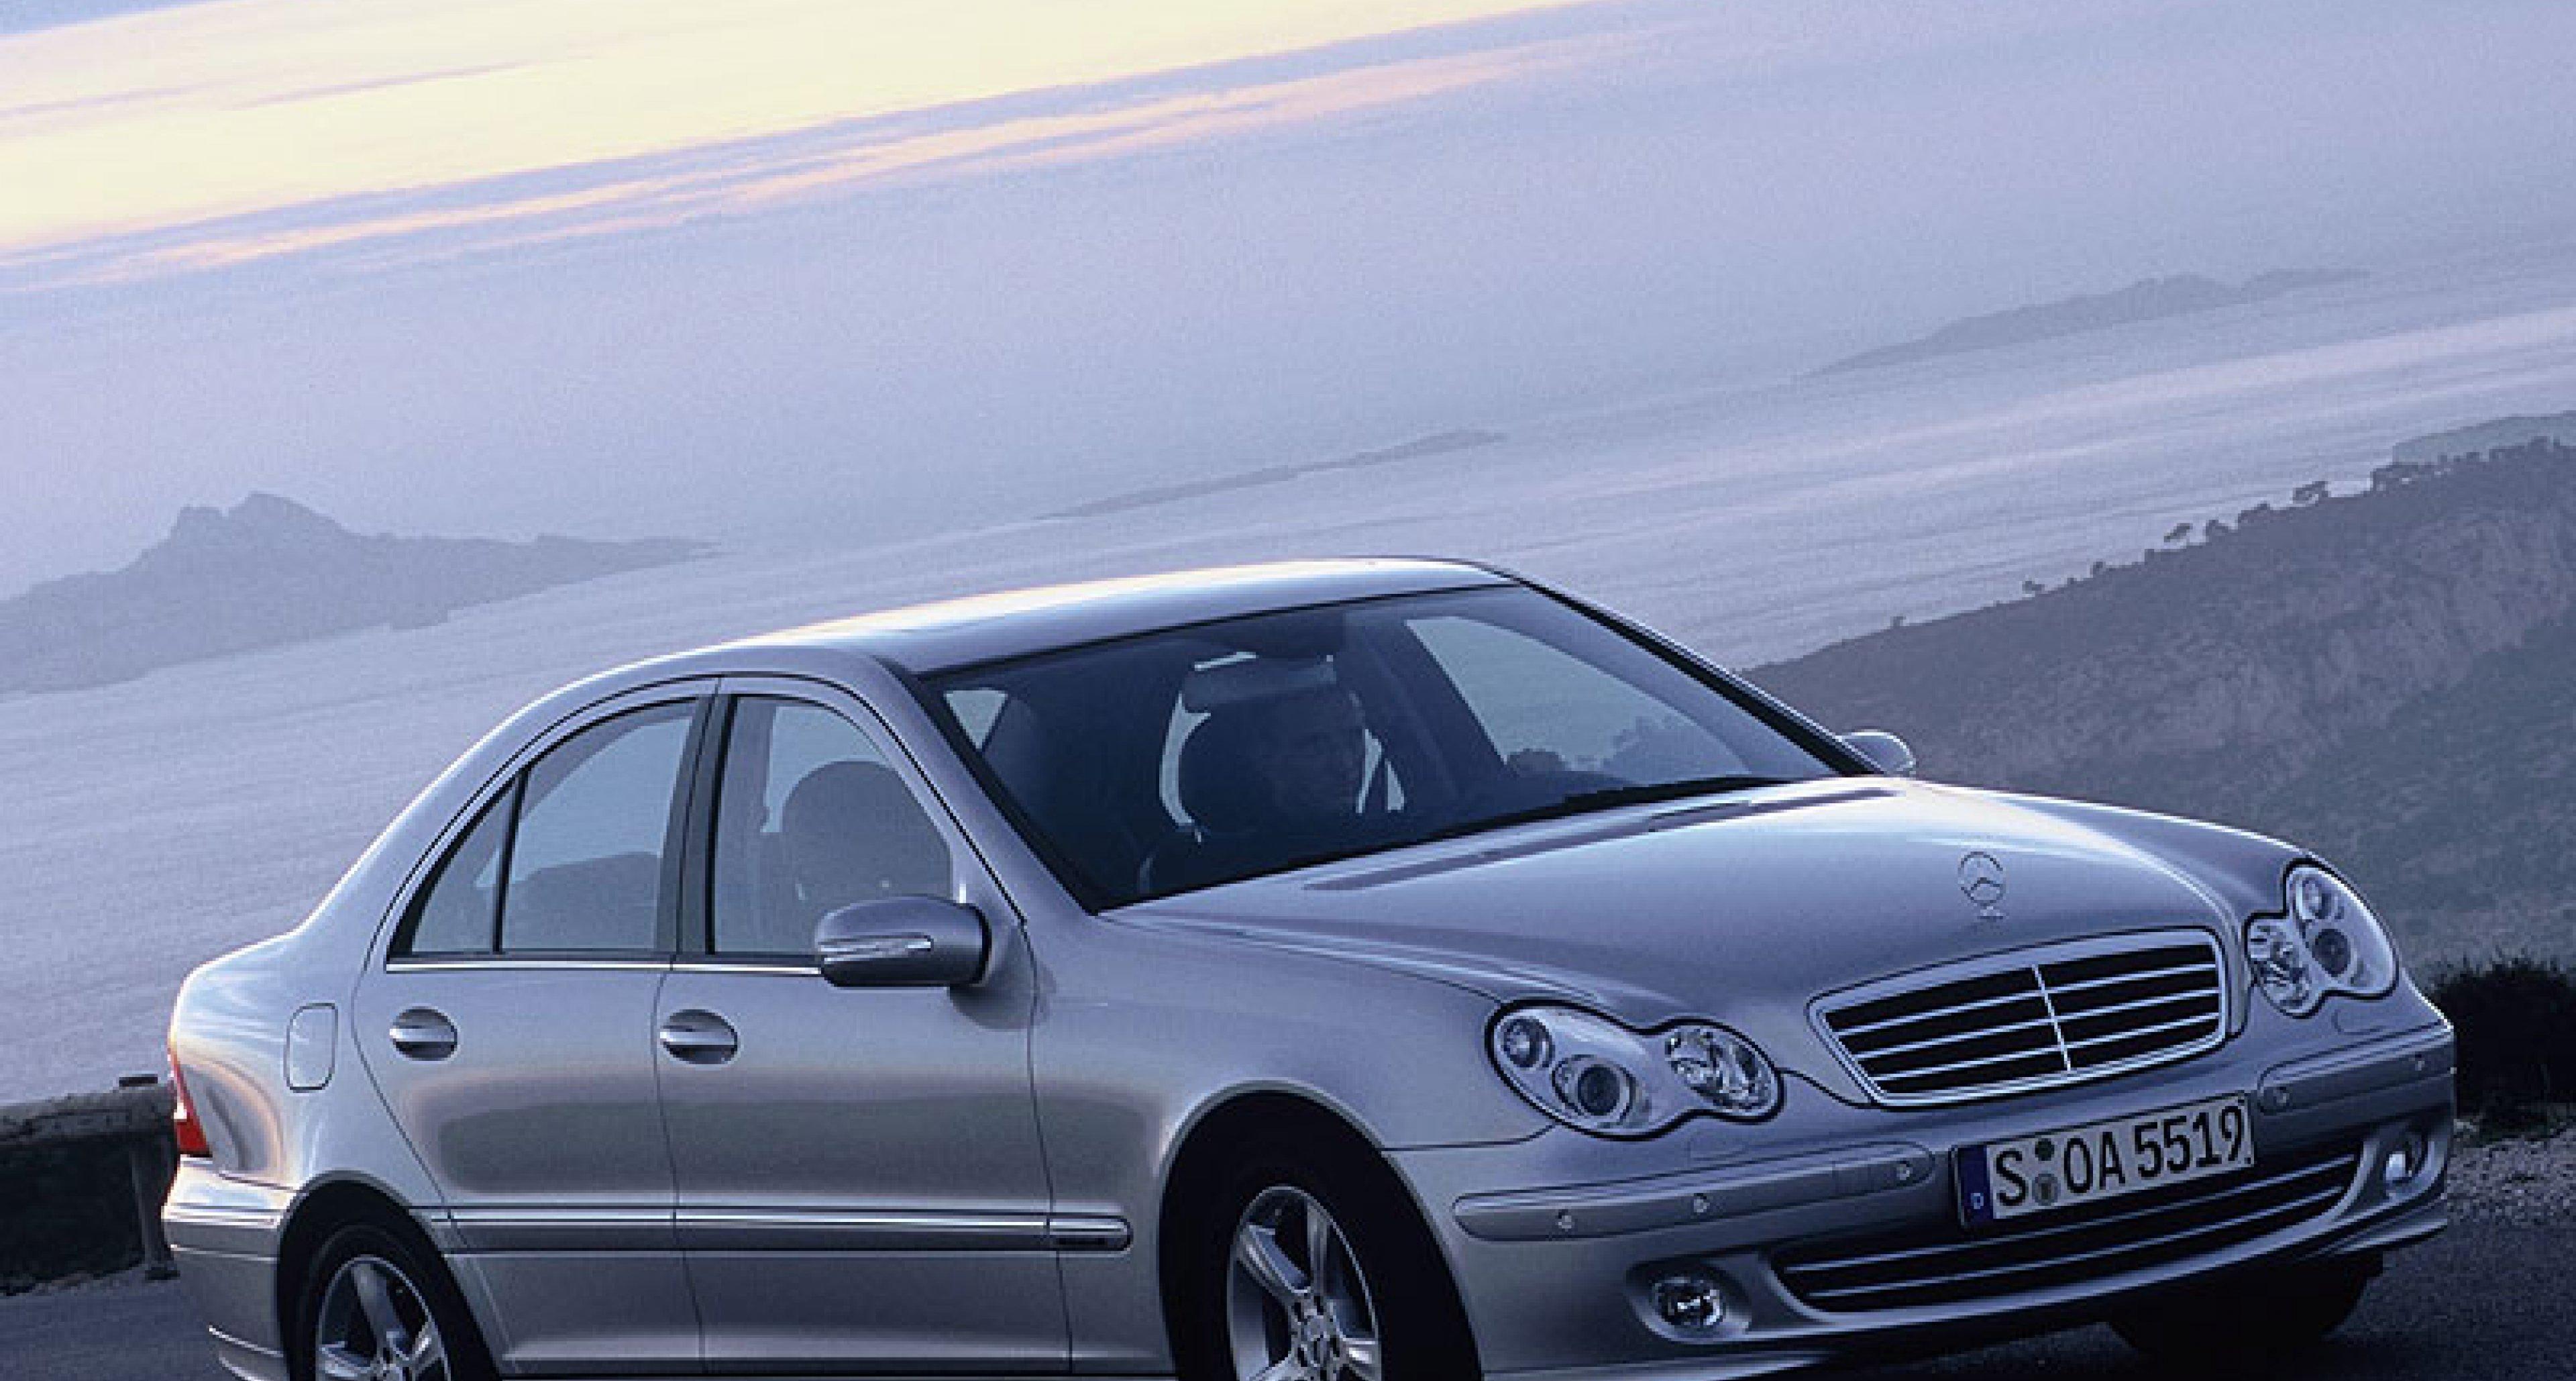 Mercedes-Benz C-Klasse: Die neue Generation kommt ab Frühjahr 2004